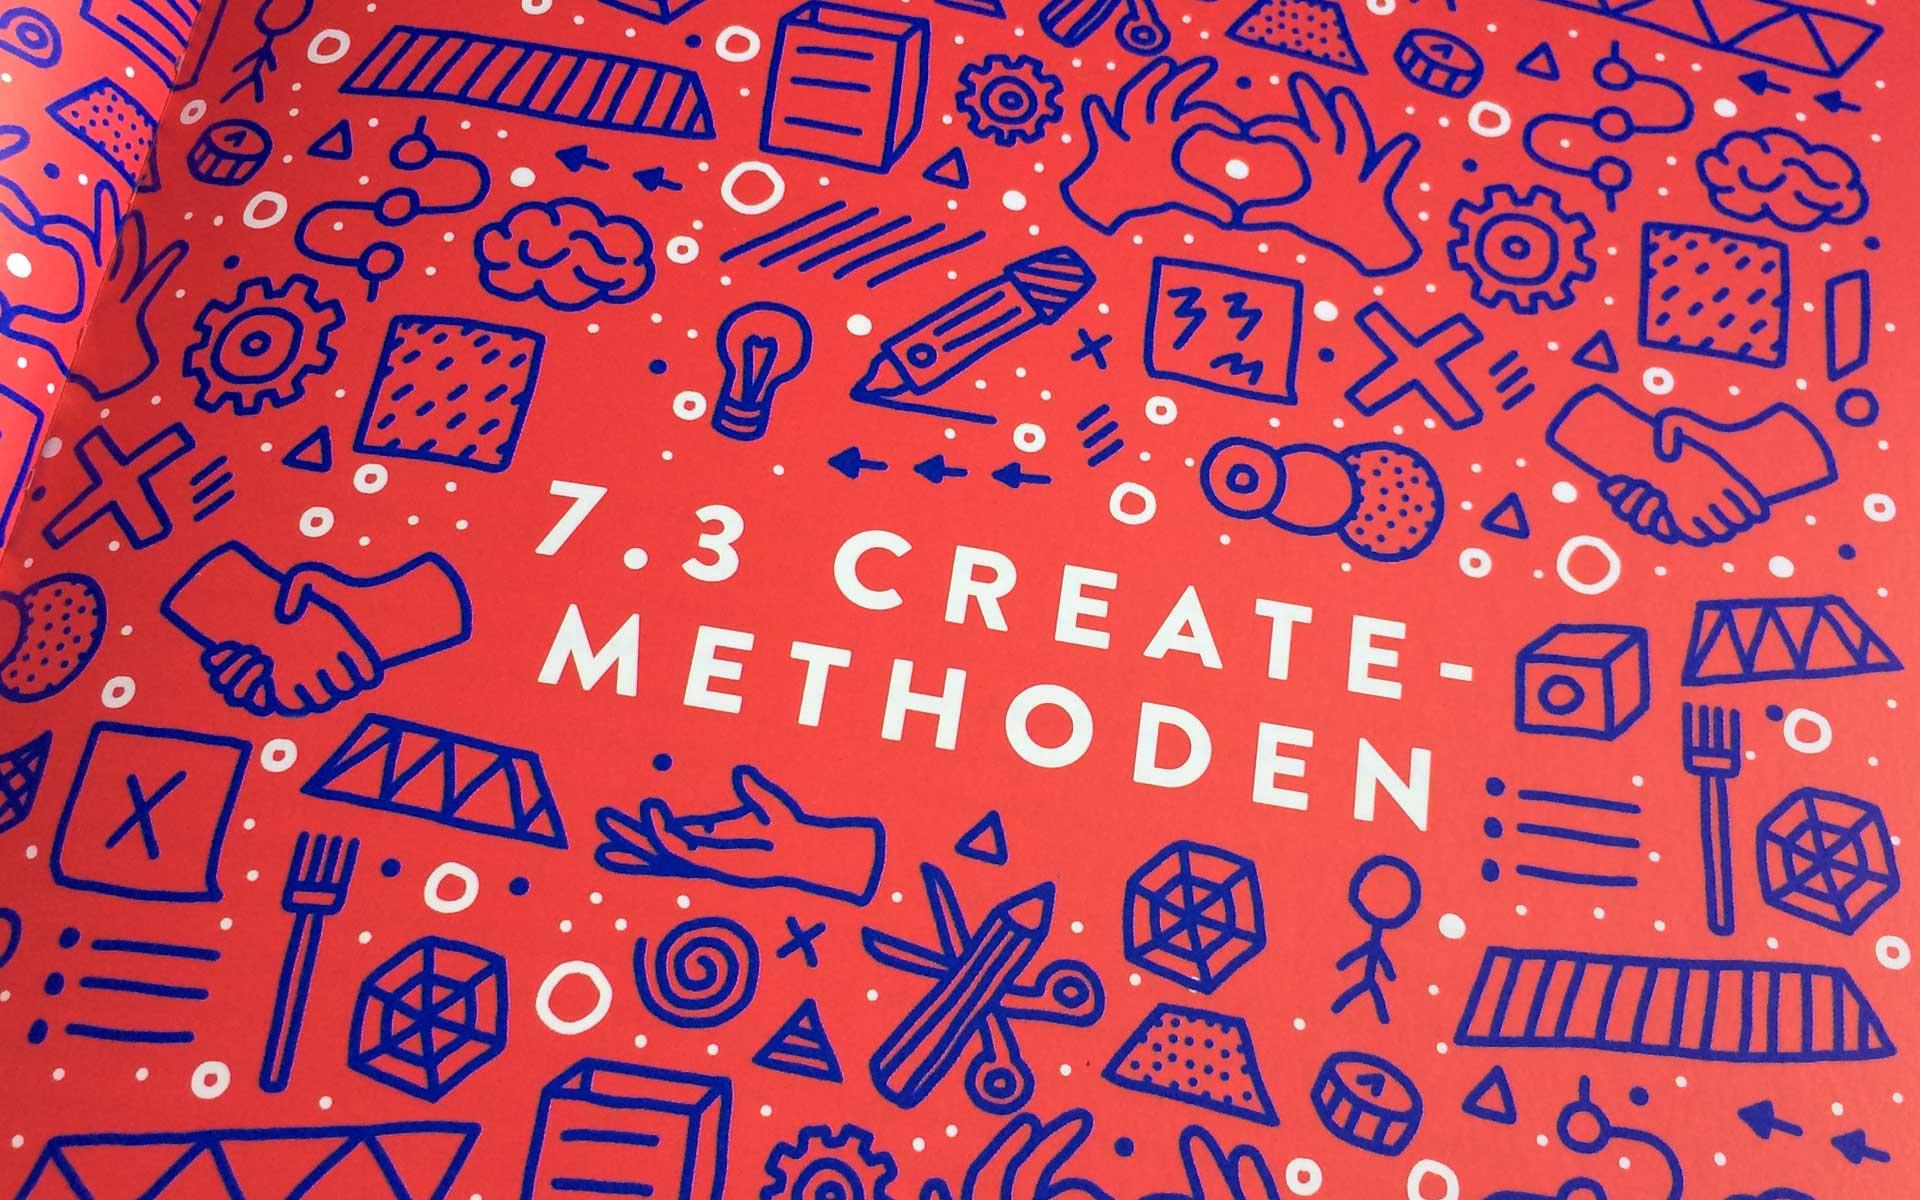 matter of design, book review, digital innovation playbook, dark horse, ideen- und Innovationsfindung